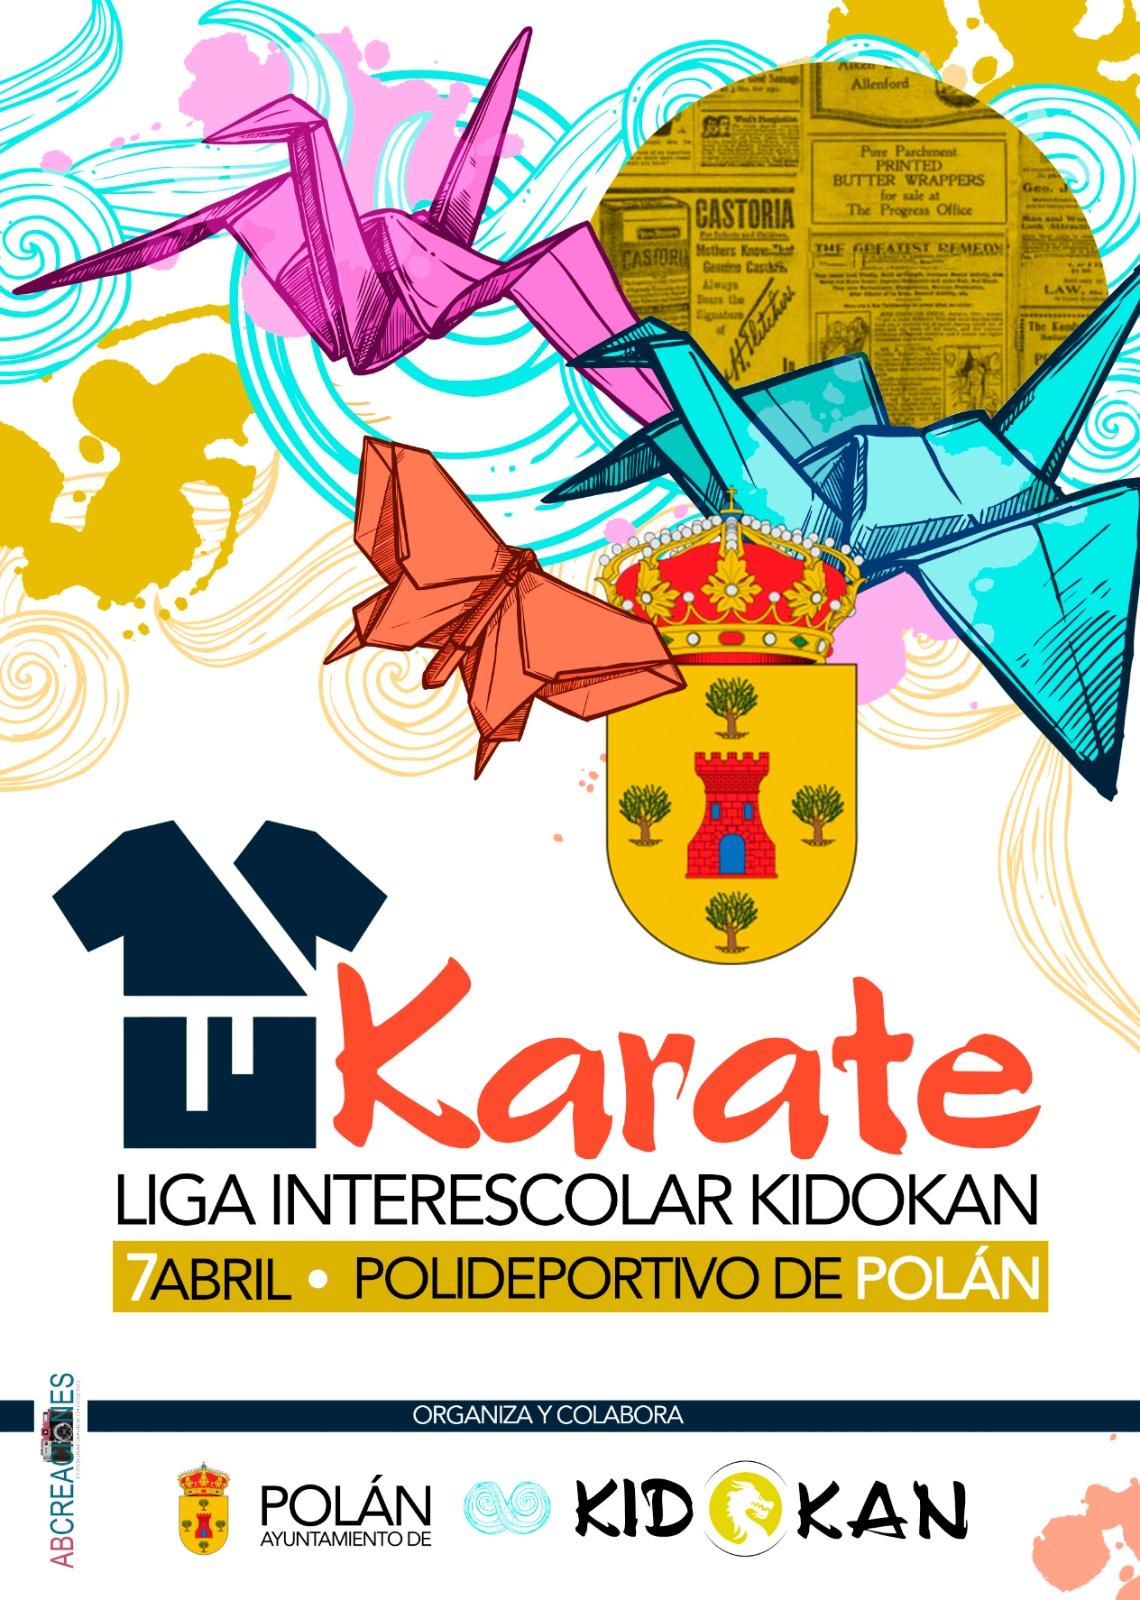 Liga Interescolar Kidokan 2019